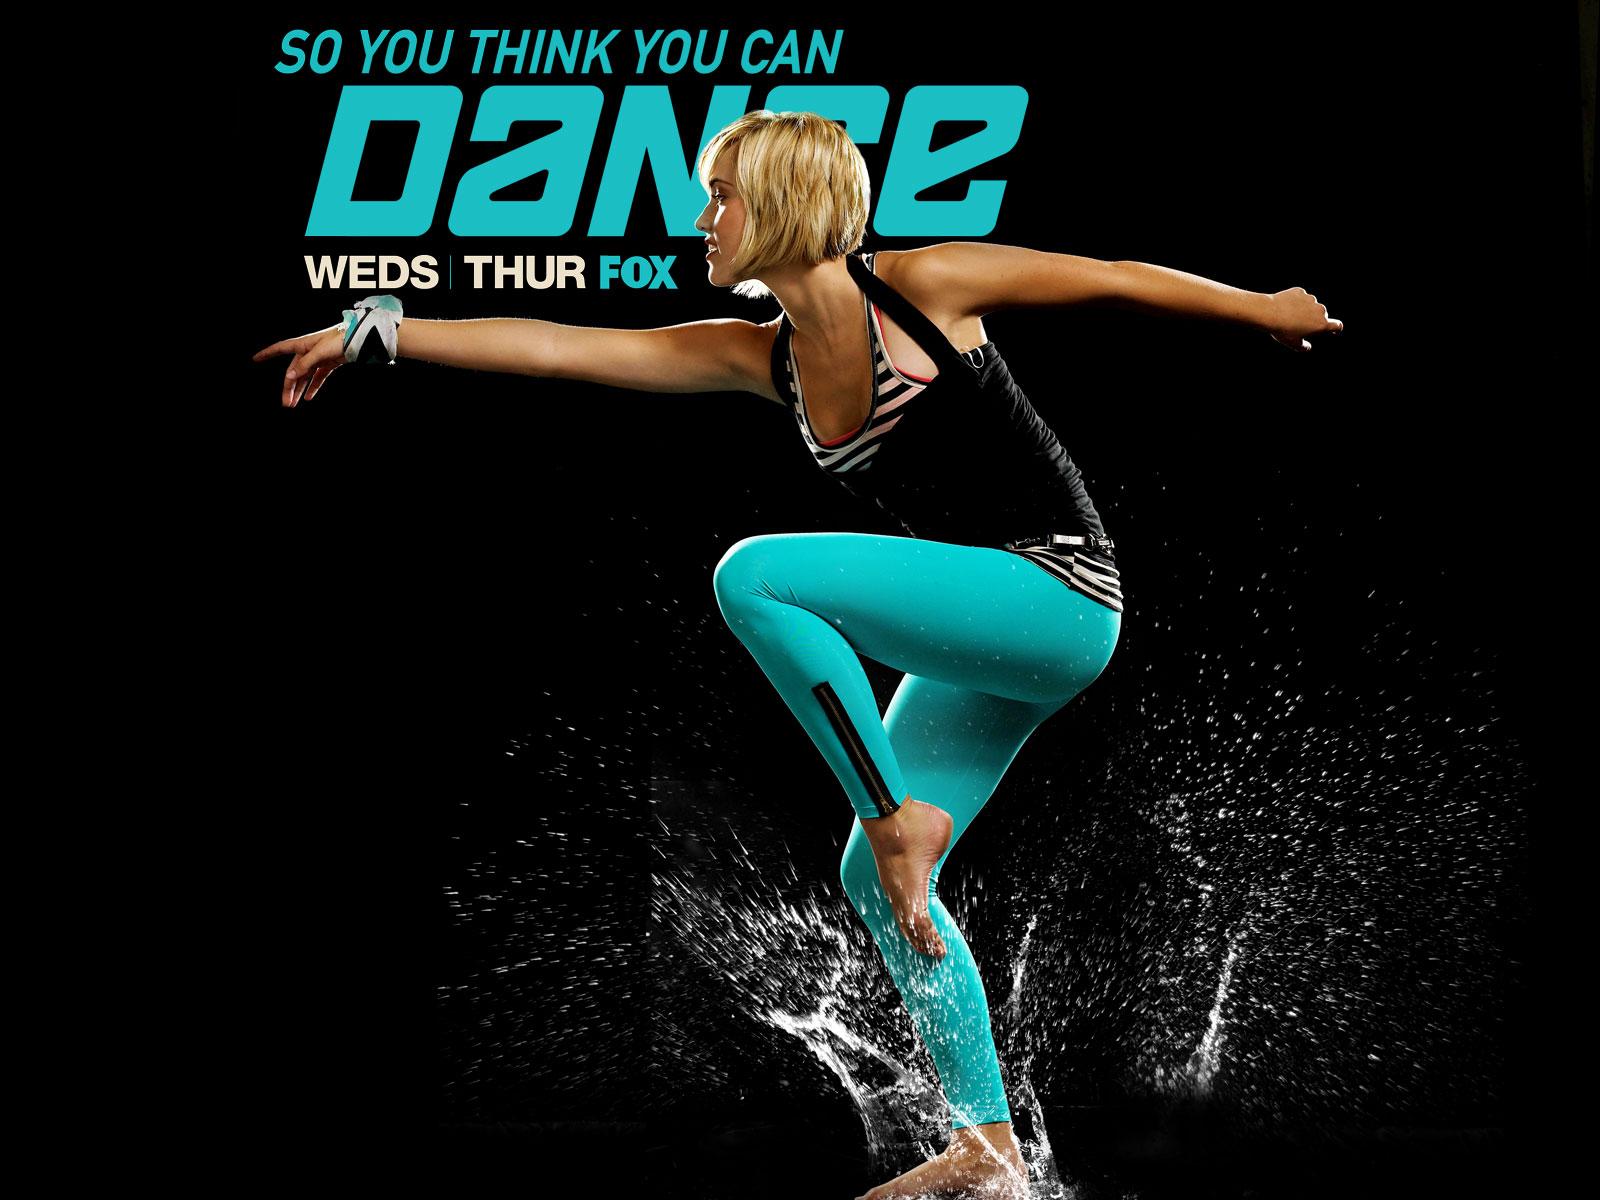 http://1.bp.blogspot.com/-GZUfpJOHnPM/Tw3lPEiaQjI/AAAAAAAAAqc/9giRNrw-AGk/s1600/so-you-think-you-can-dance-wallpaper.jpg